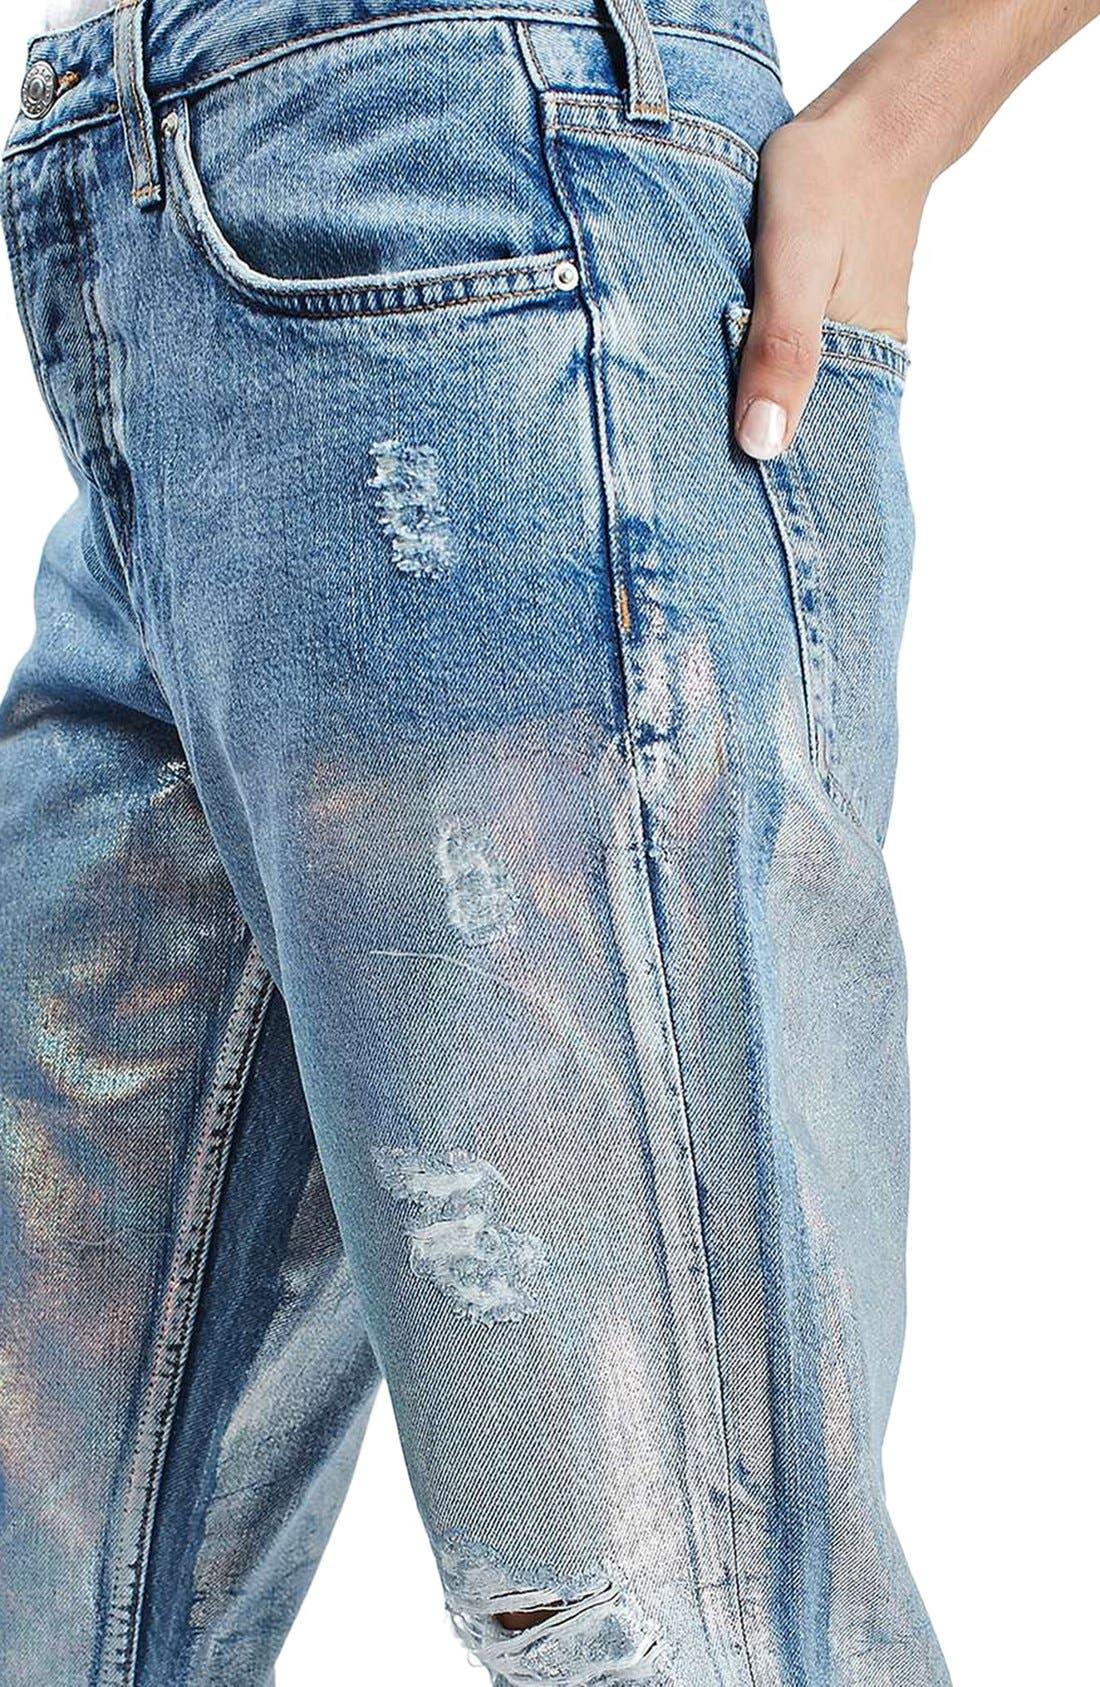 Alternate Image 3  - Topshop 'Hayden' Metallic Distressed Boyfriend Jeans (Regular & Petite)